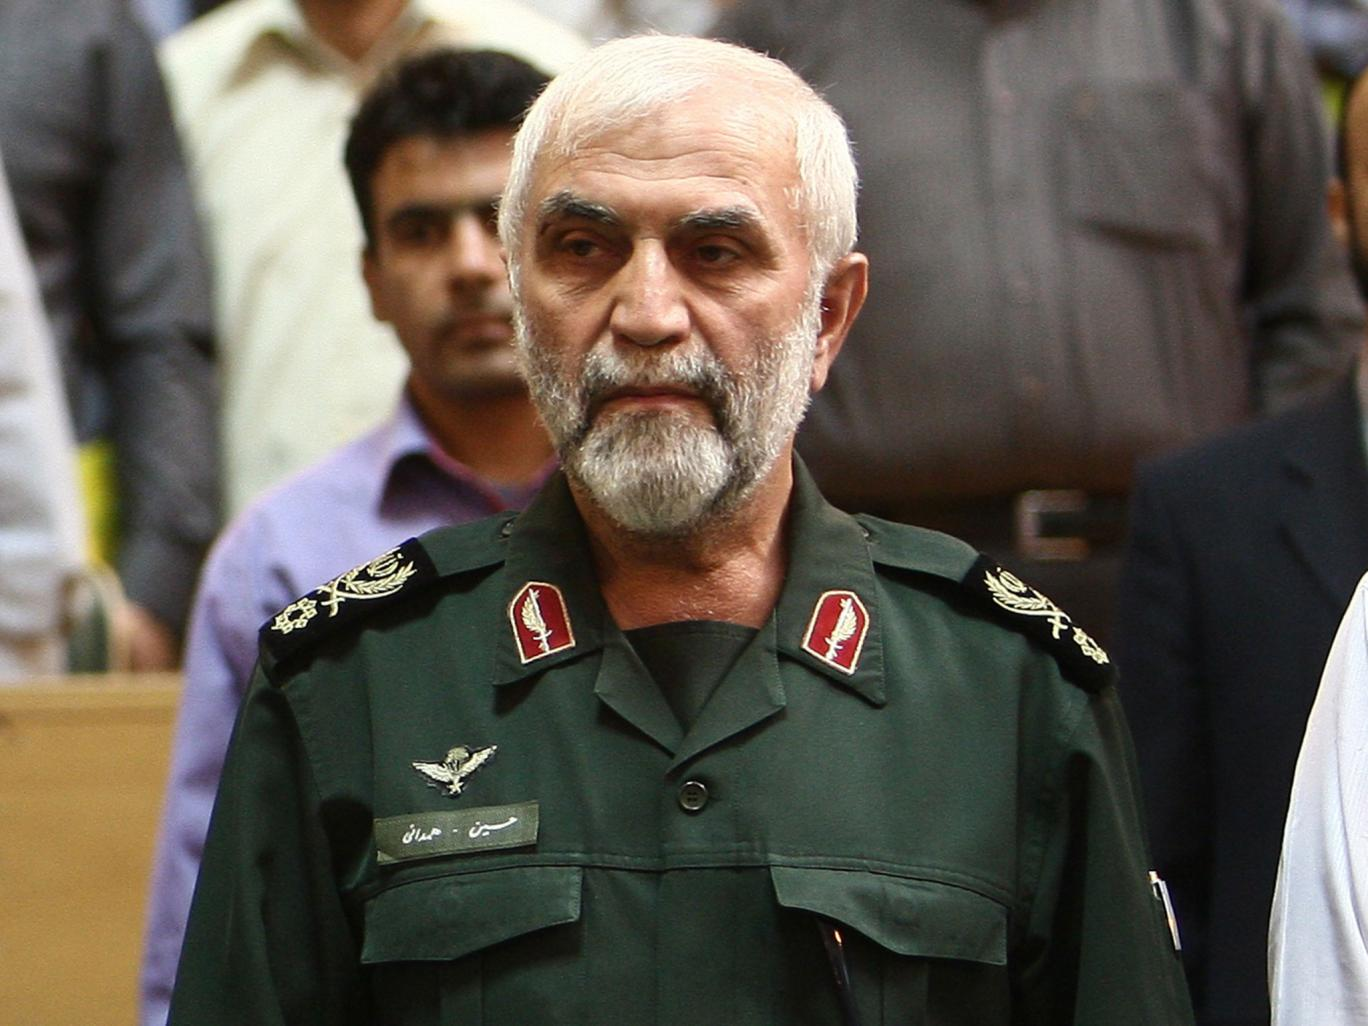 Hossein Hamadani